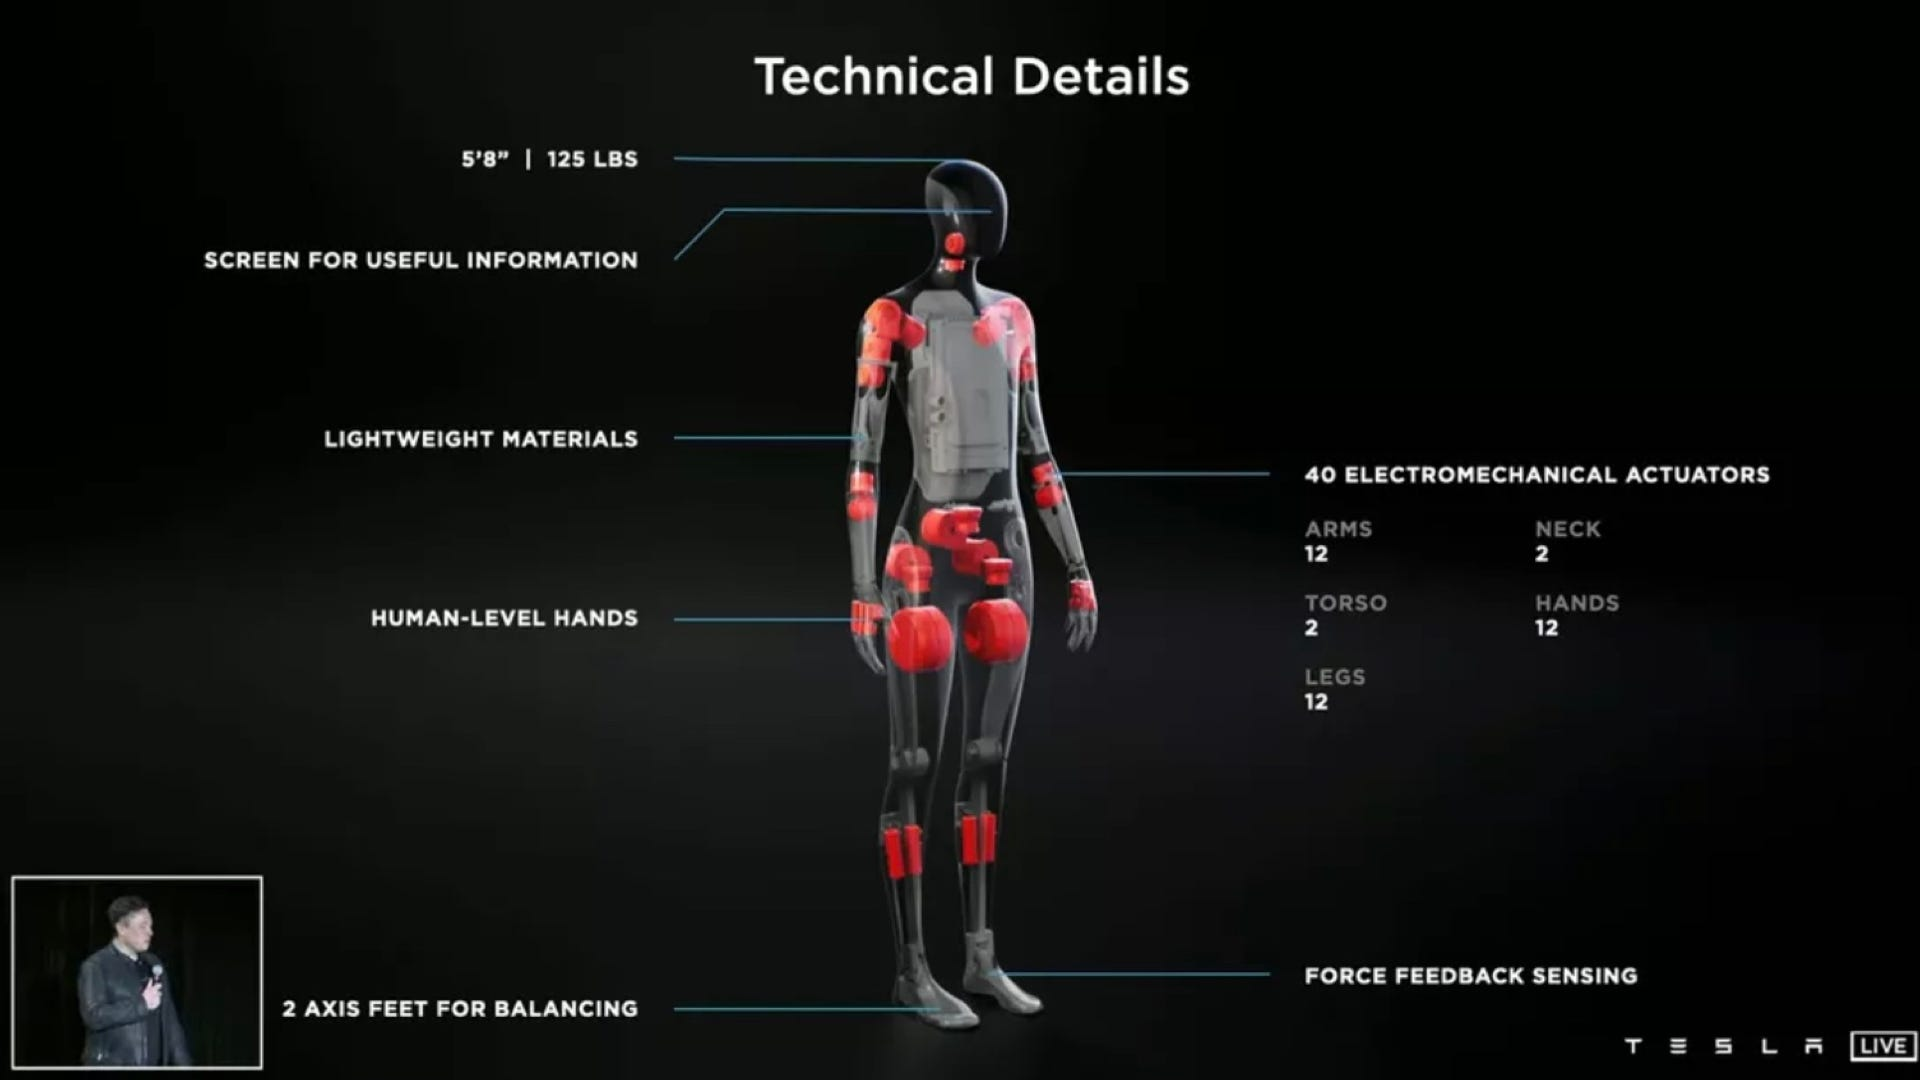 Tesla Robot specs